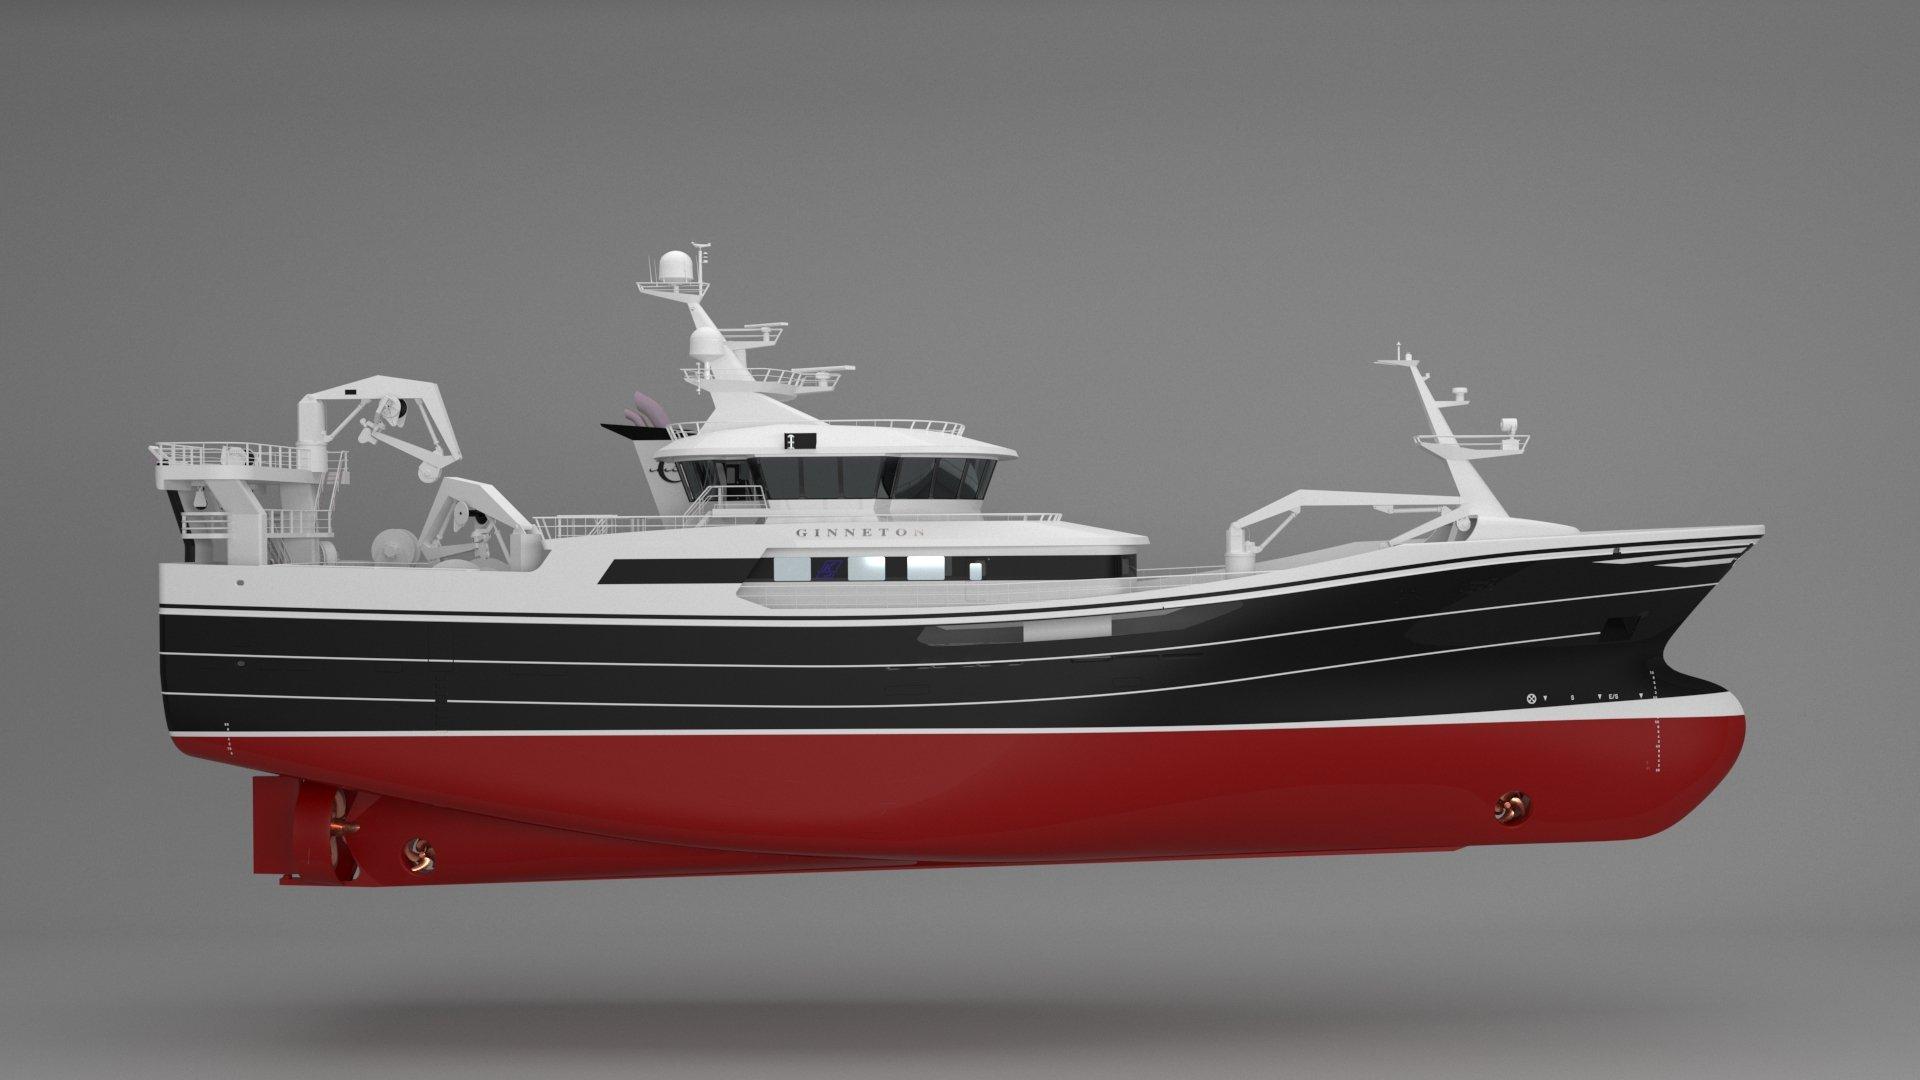 ginneton trawler Karstensens Shipyard